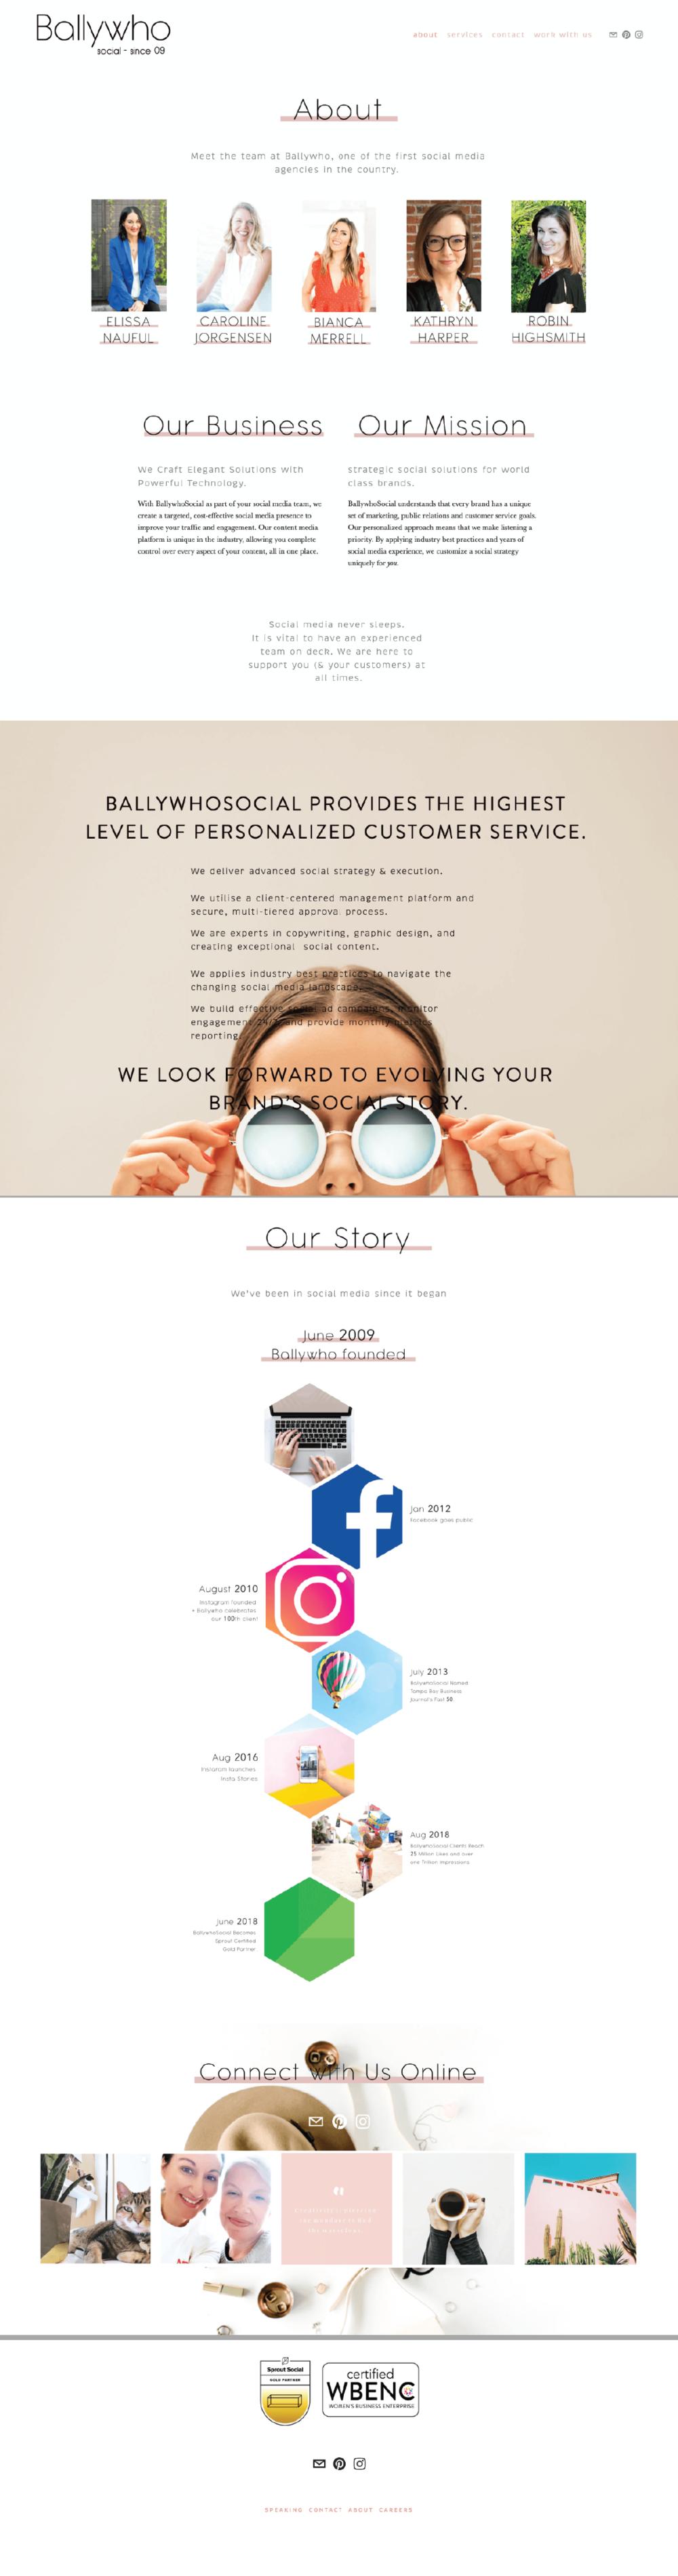 website-web-design-branding-social-media-ballywhosocial-branding-entrepreneur-squarespace-diy